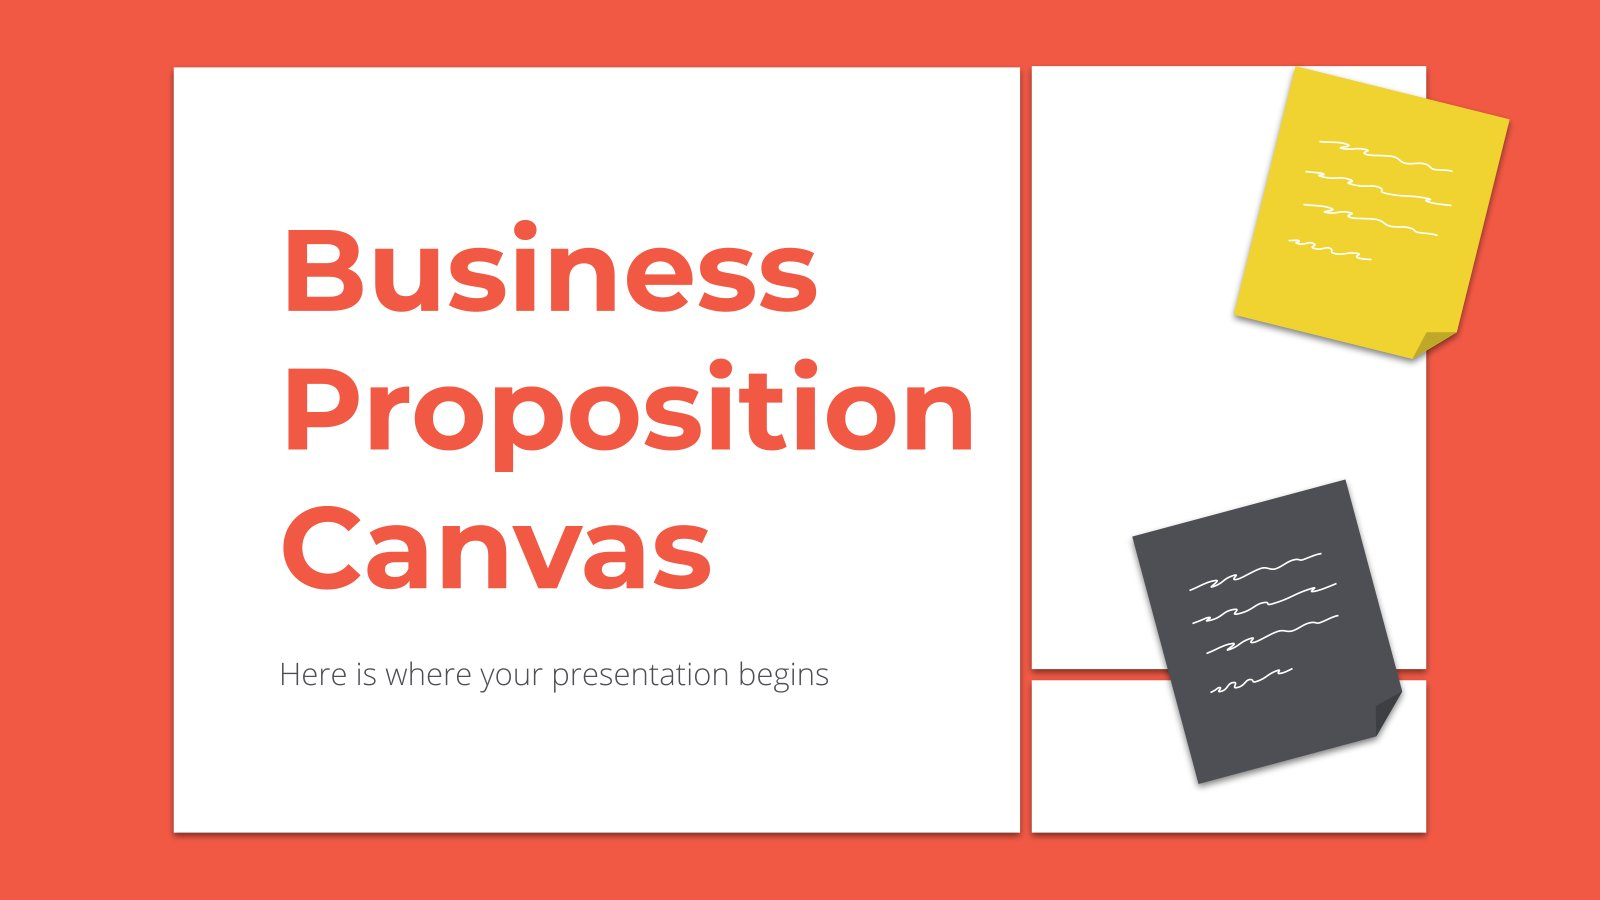 Business Proposition Canvas presentation template